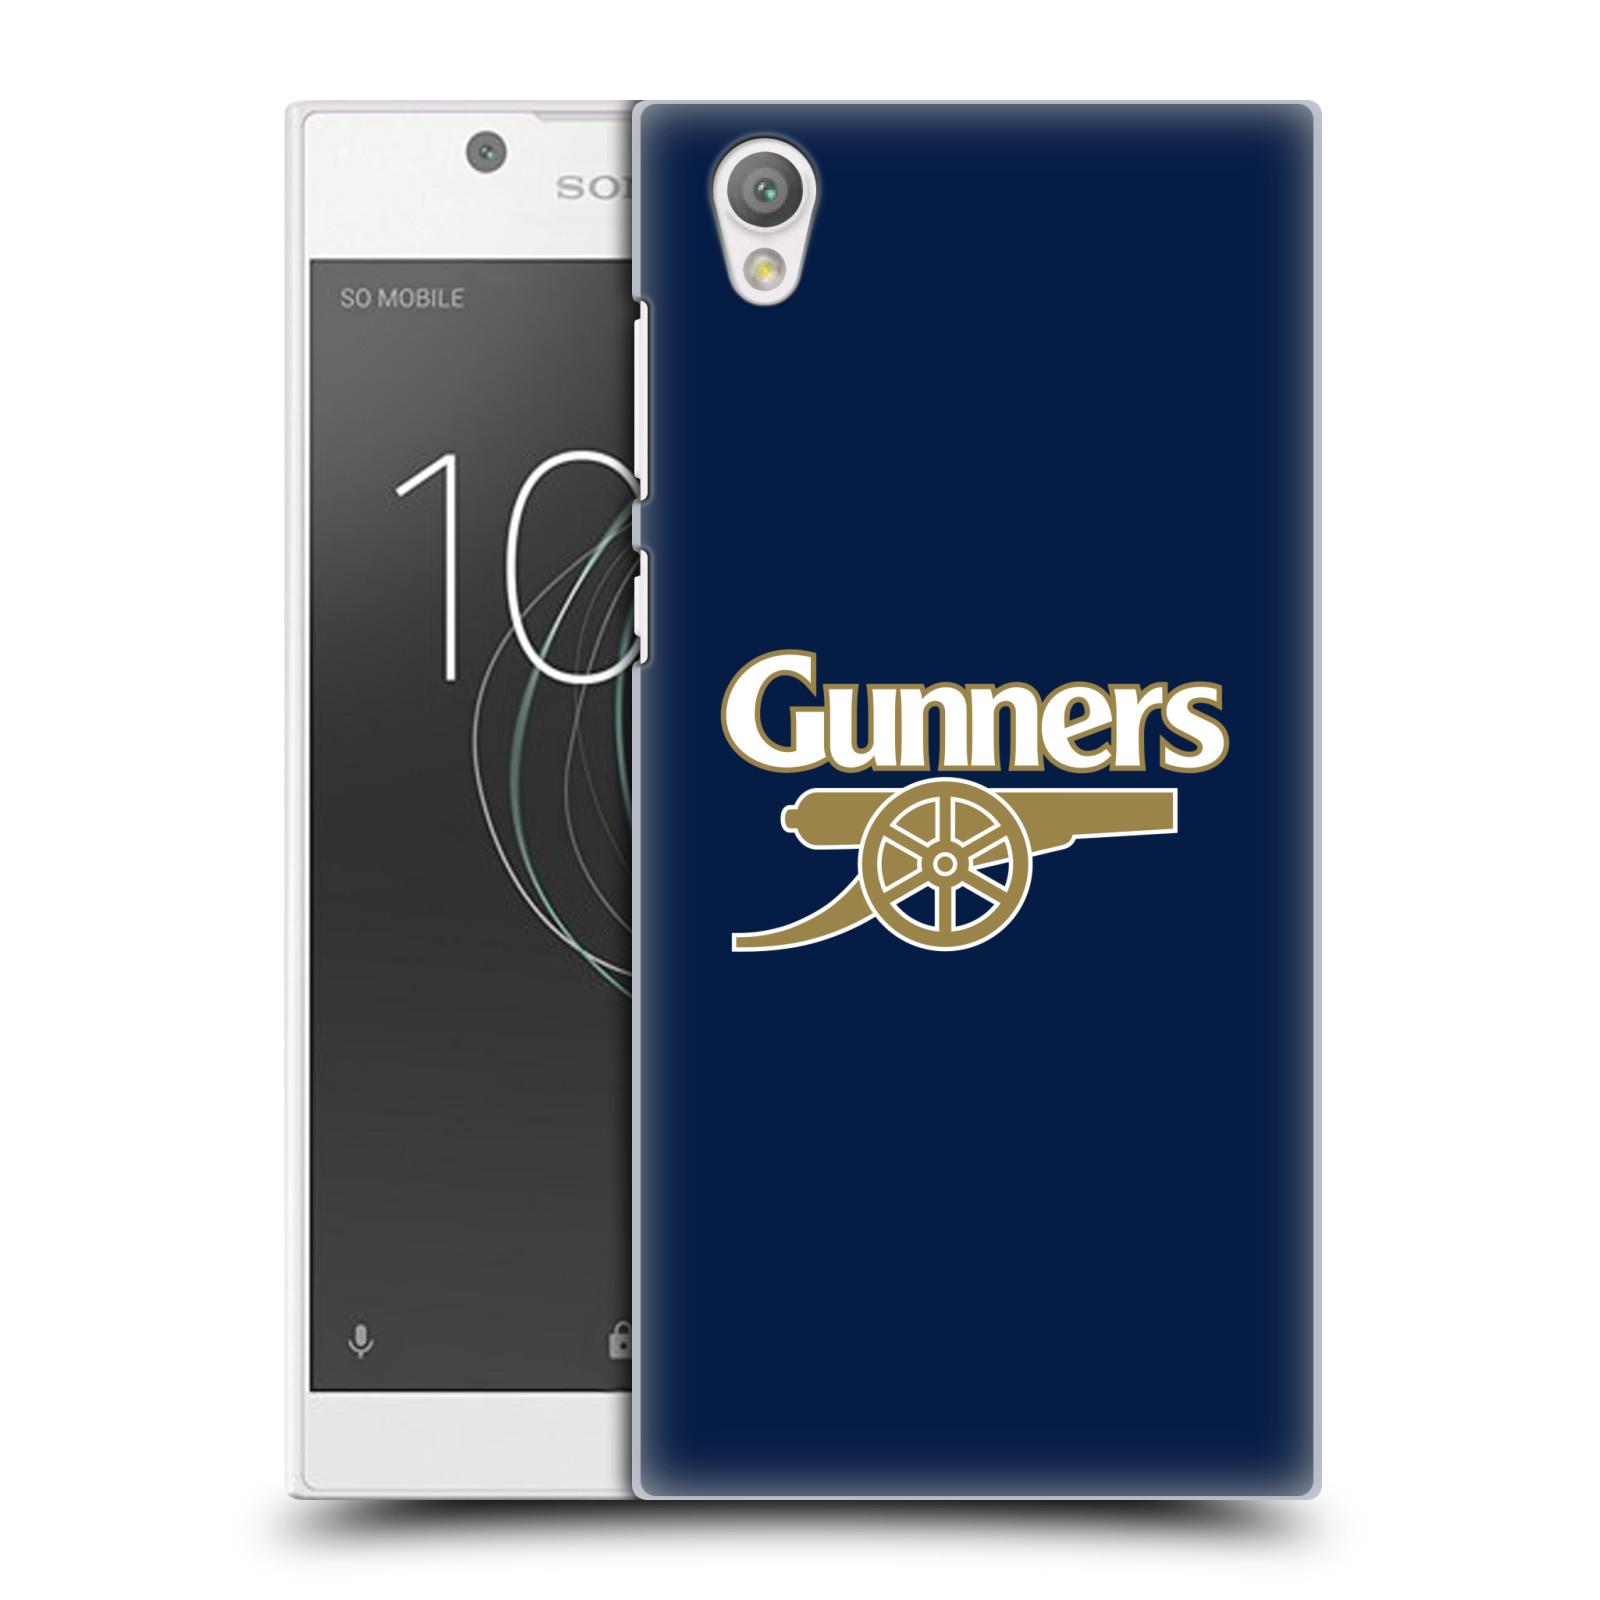 Plastové pouzdro na mobil Sony Xperia L1 - Head Case - Arsenal FC - Gunners